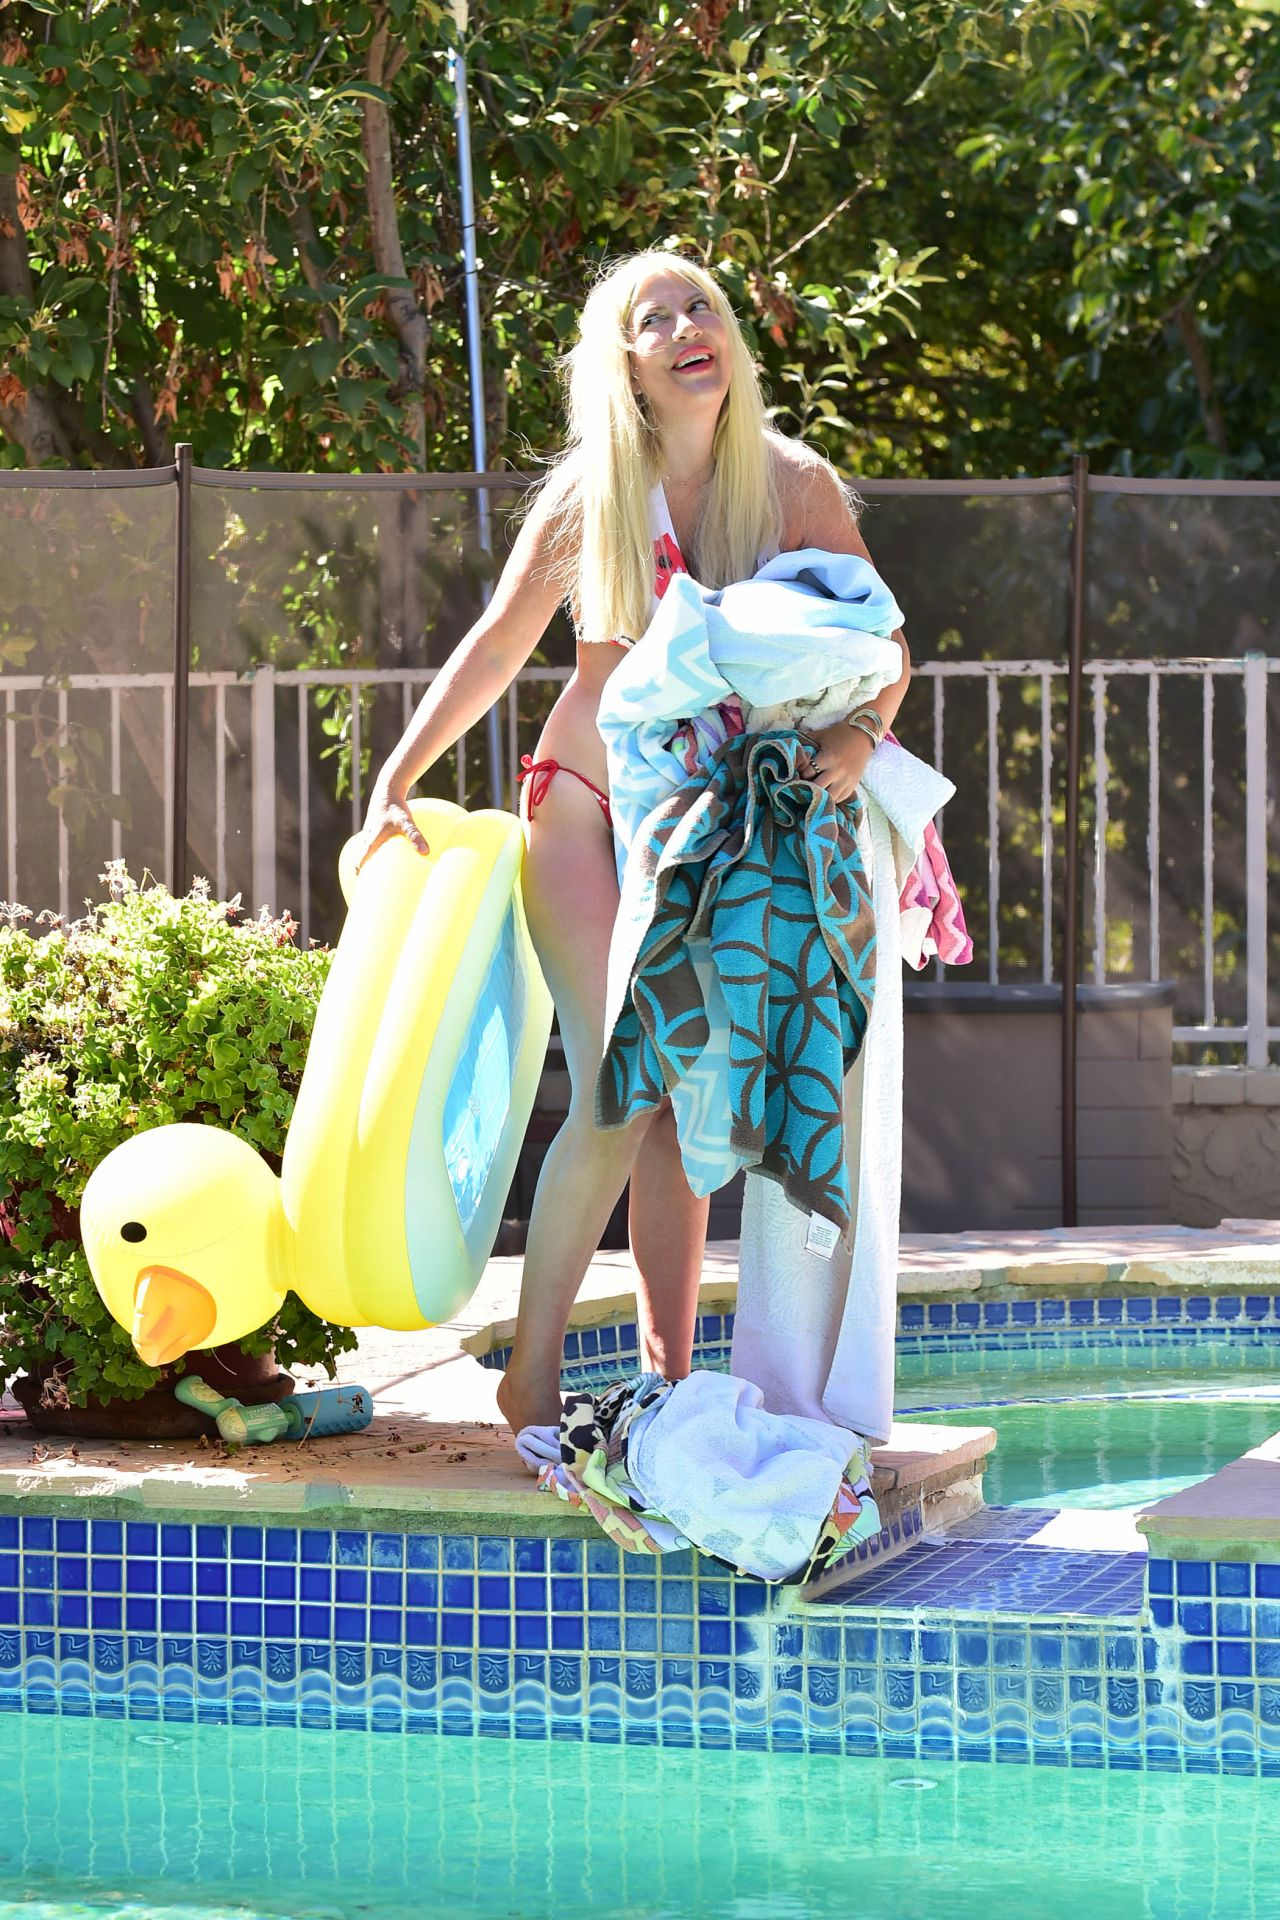 Tori Spelling In A Bikini By The Pool In Malibu 09 18 2019